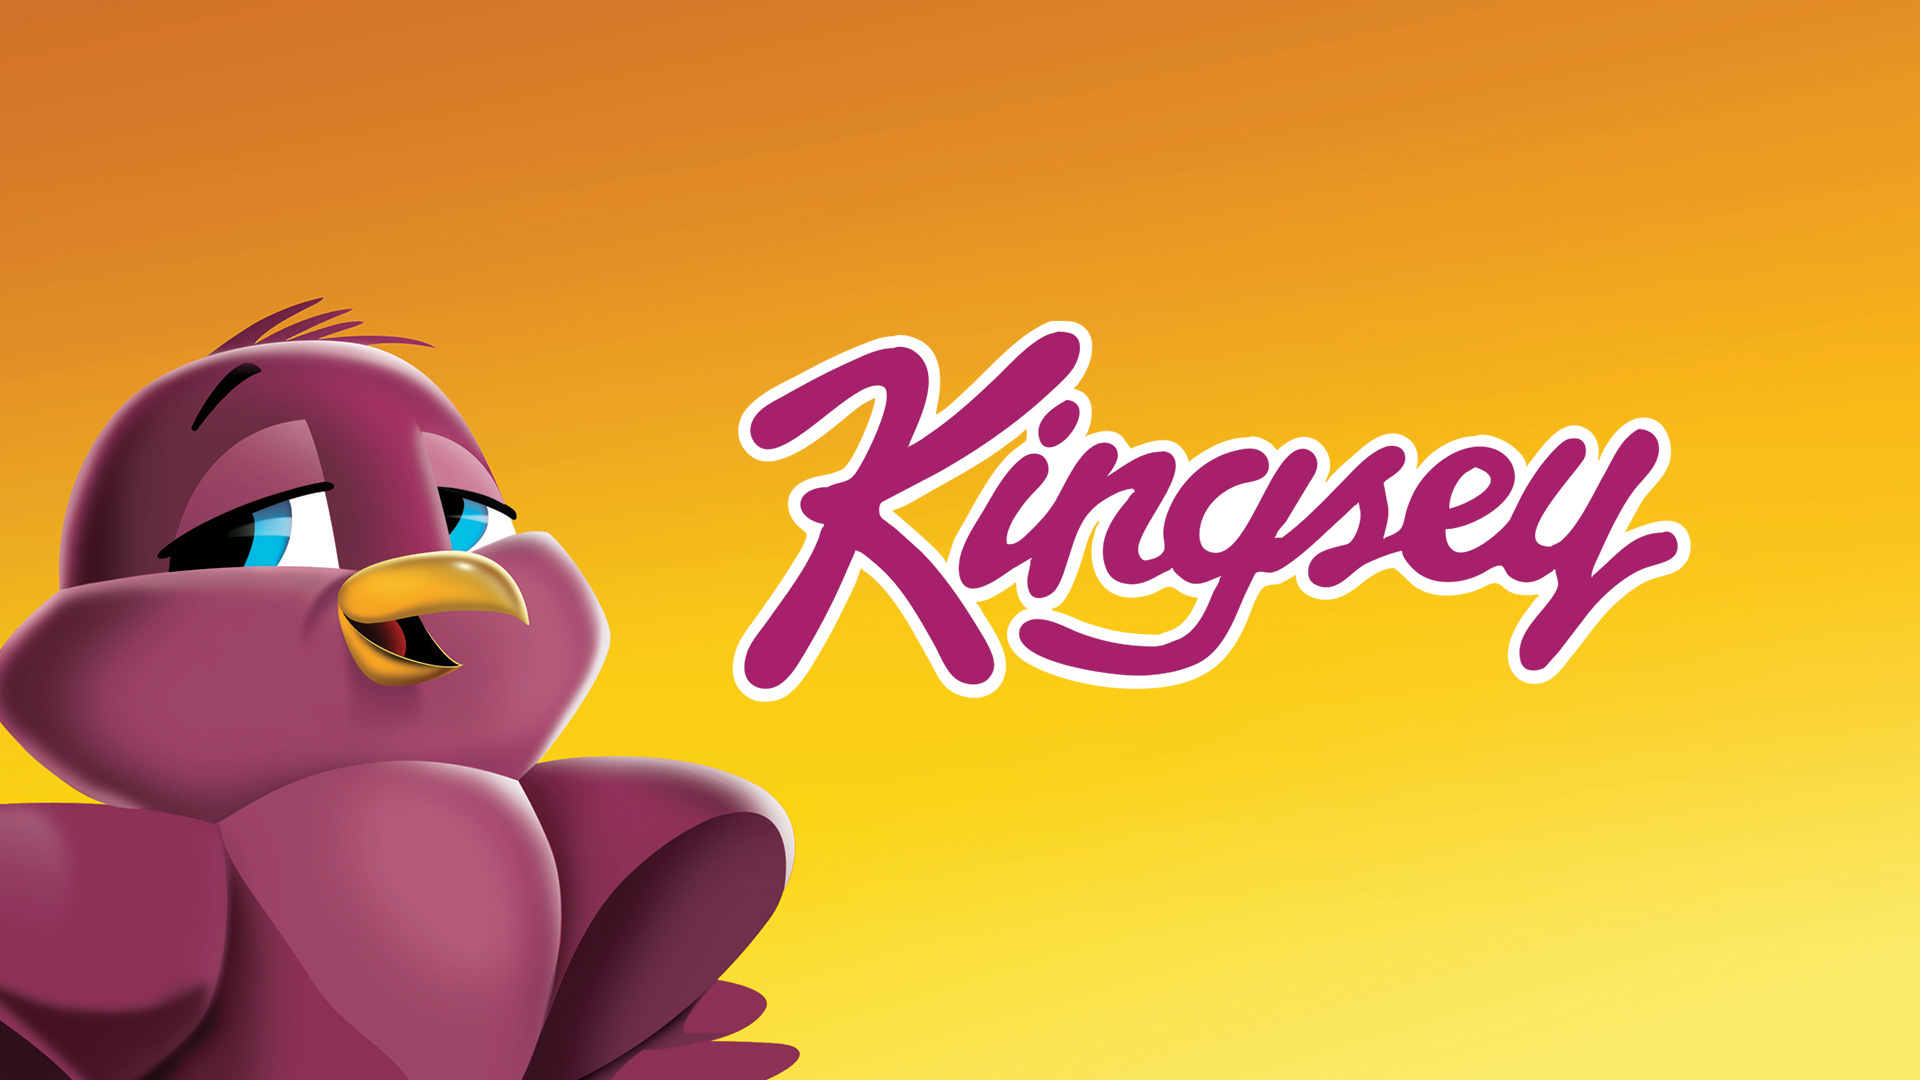 Kingsey_01